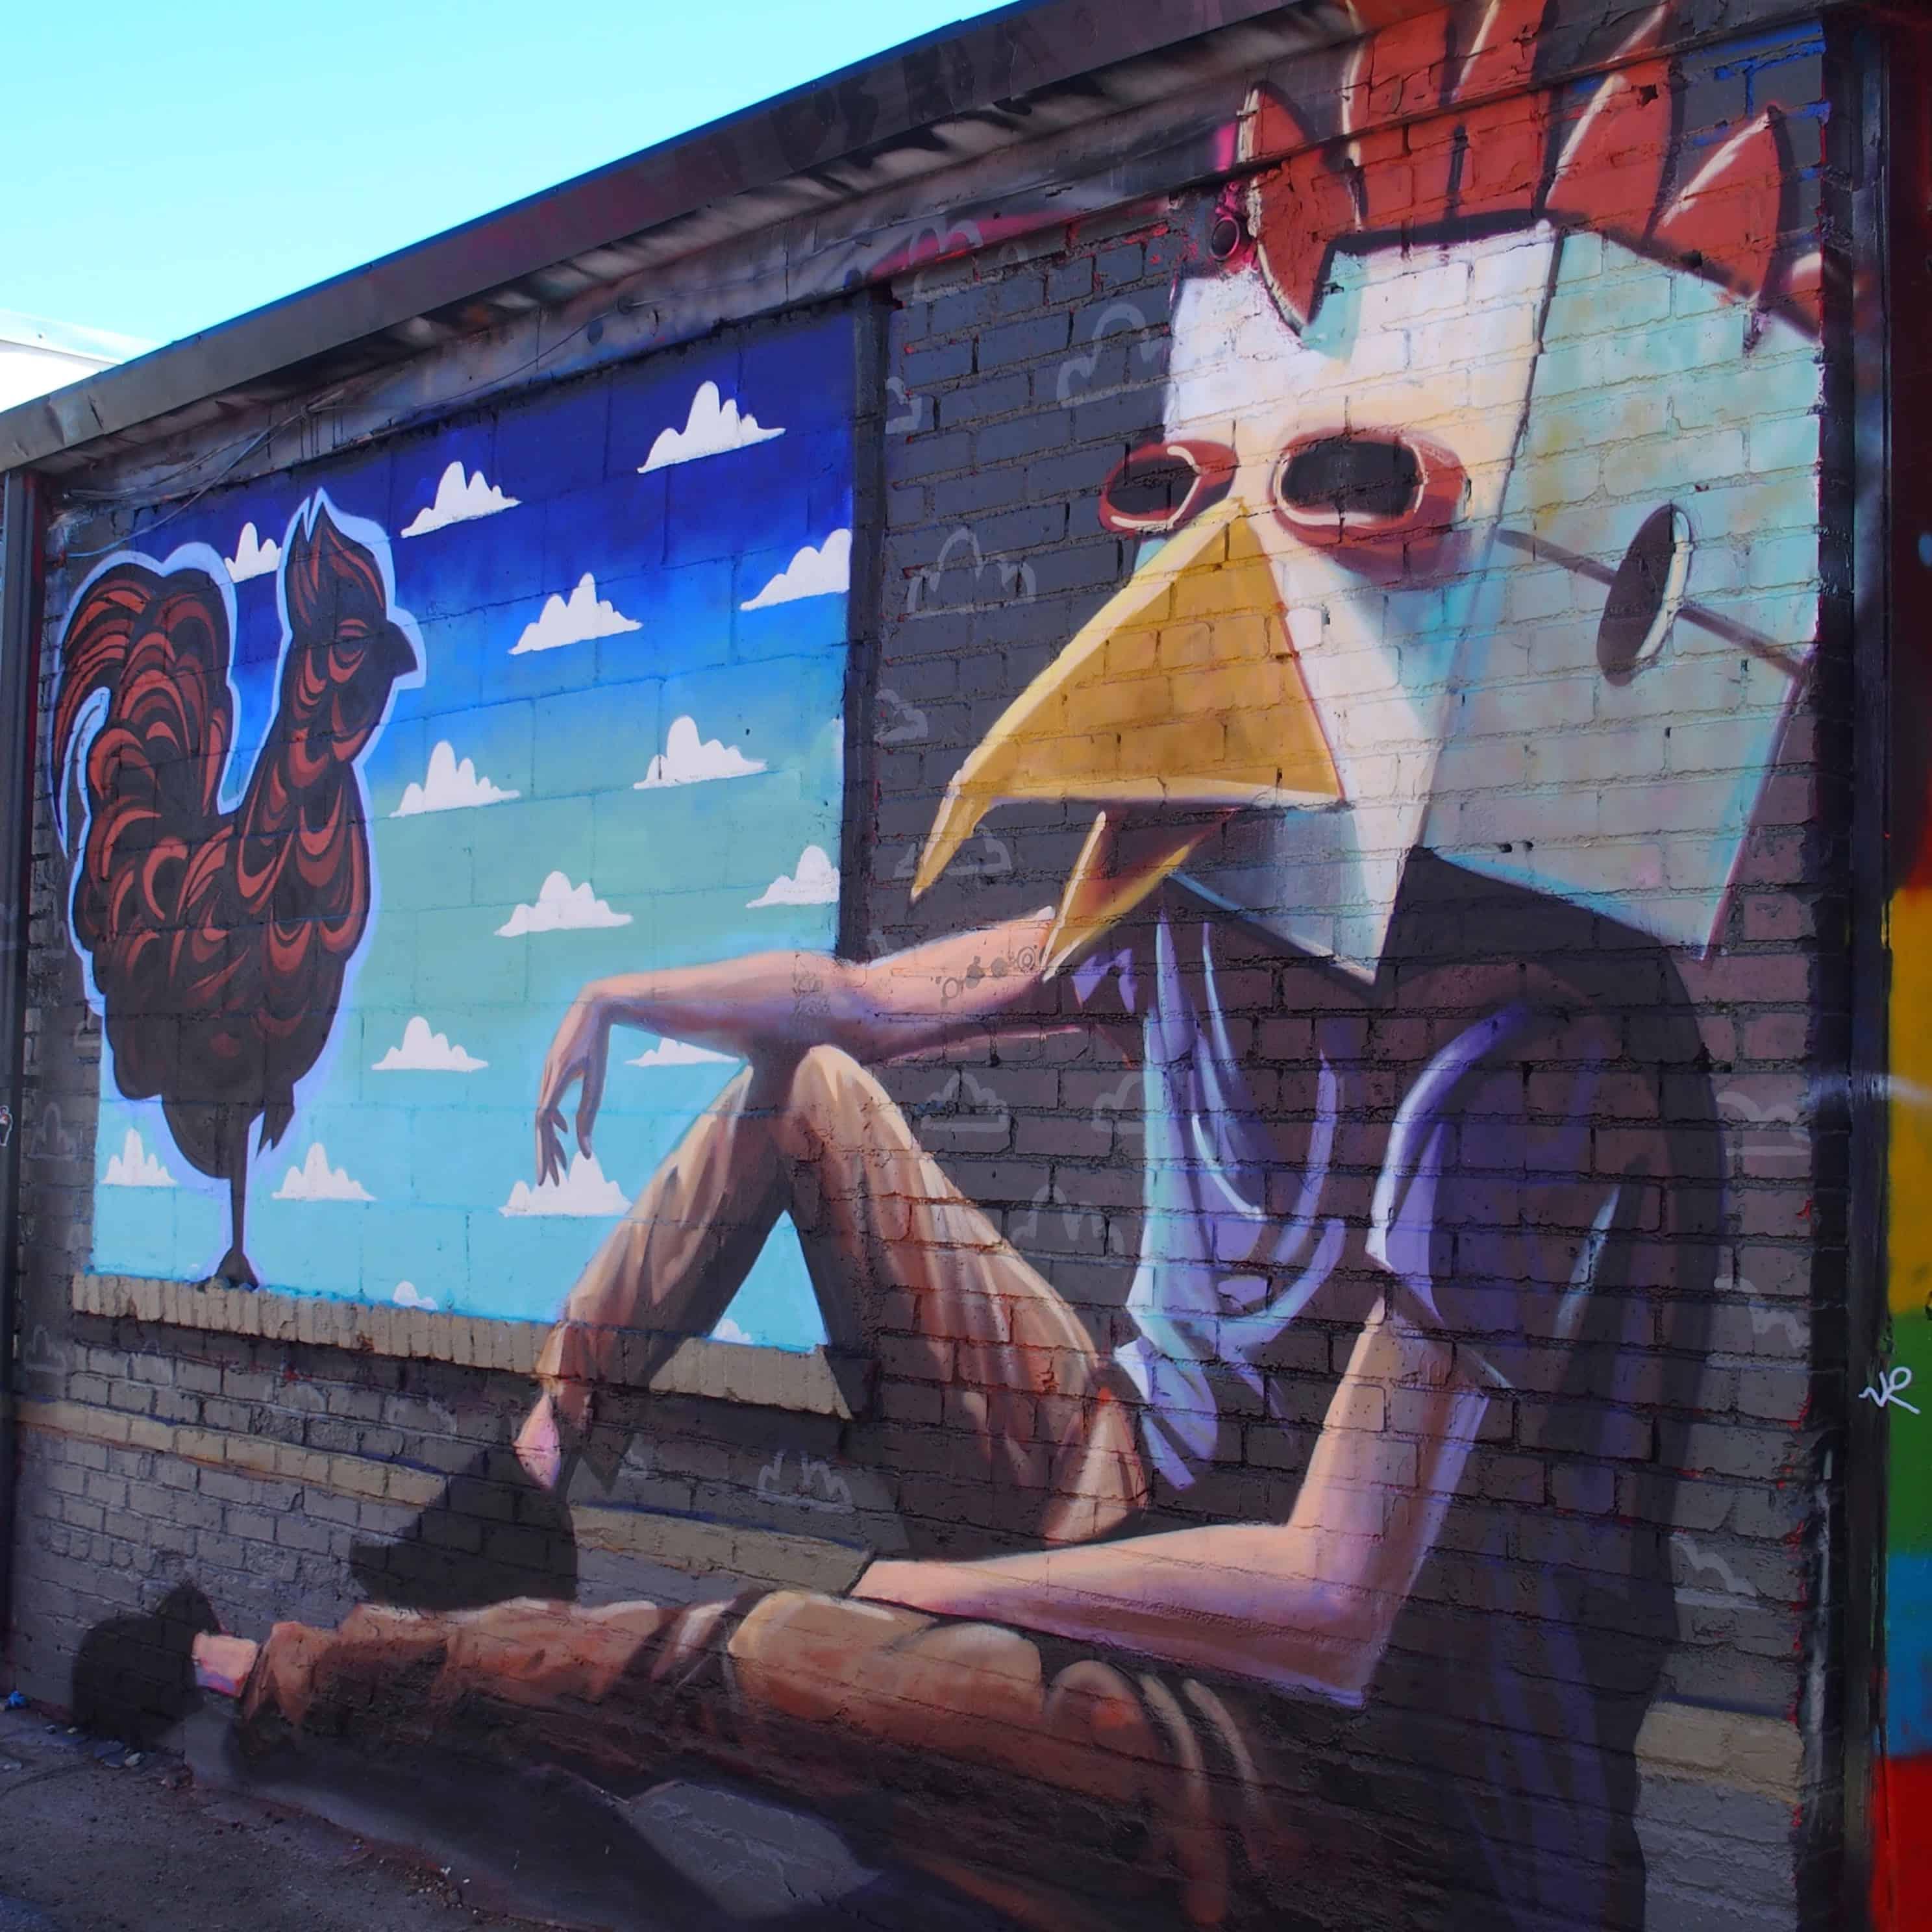 Crush 2017 Denver S Outdoor Gallery Of Graffiti Street Art And